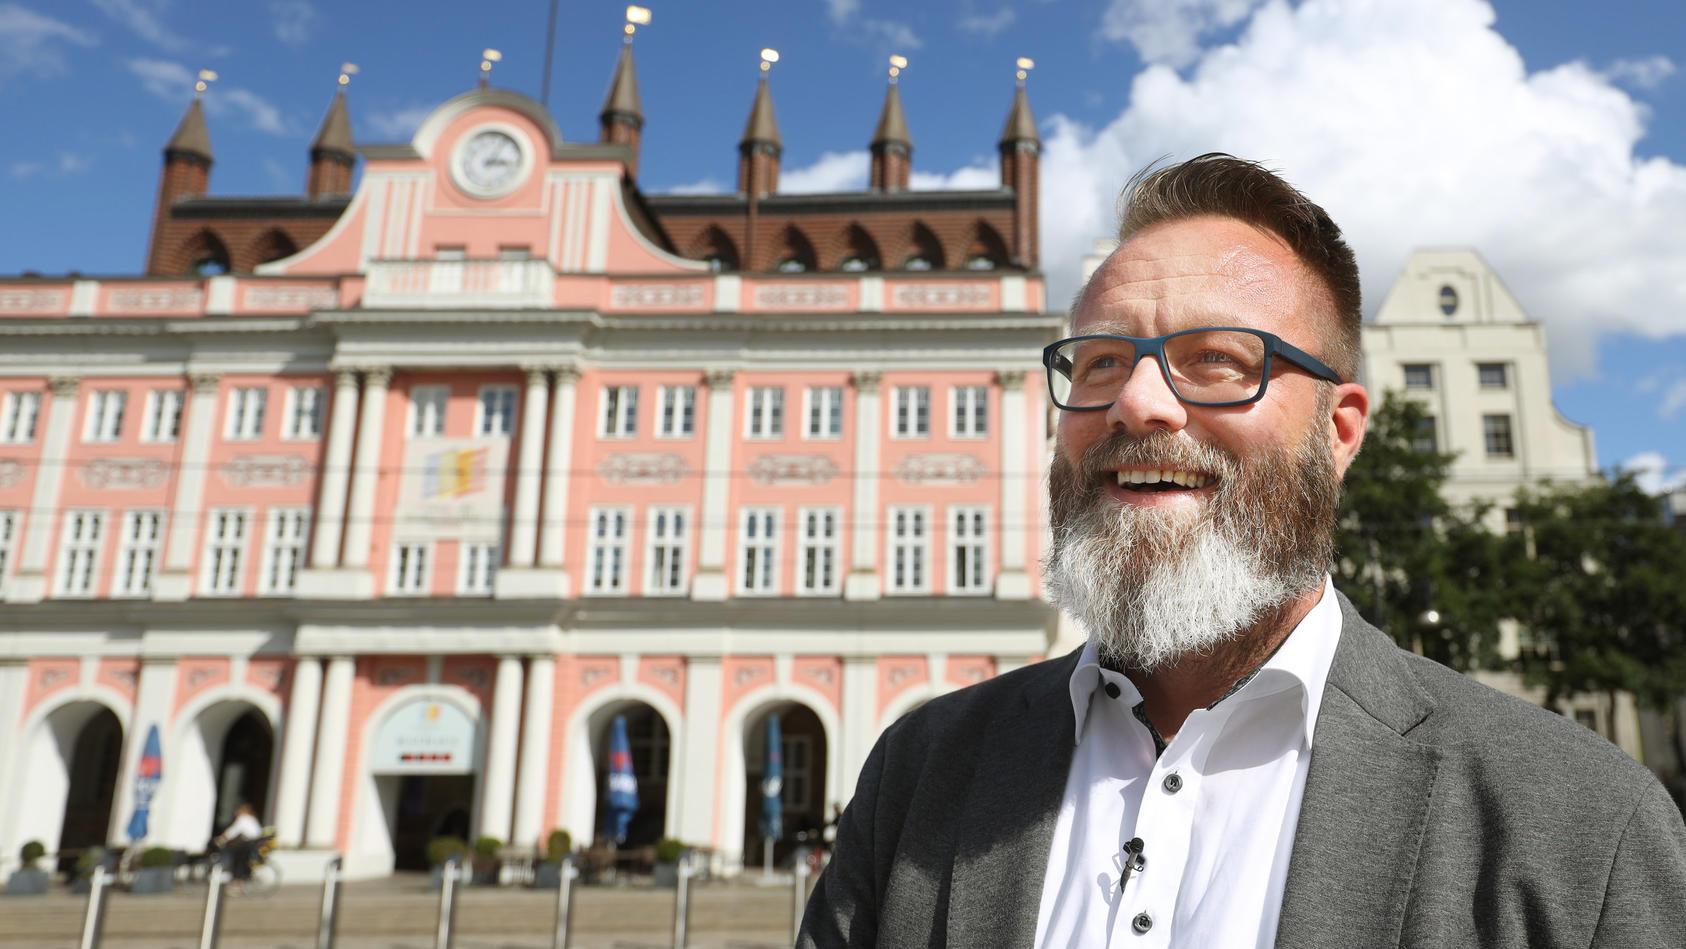 Laut Oberbürgermeister Claus Ruhe Madsen ist Rostock aktuell Corona-frei.